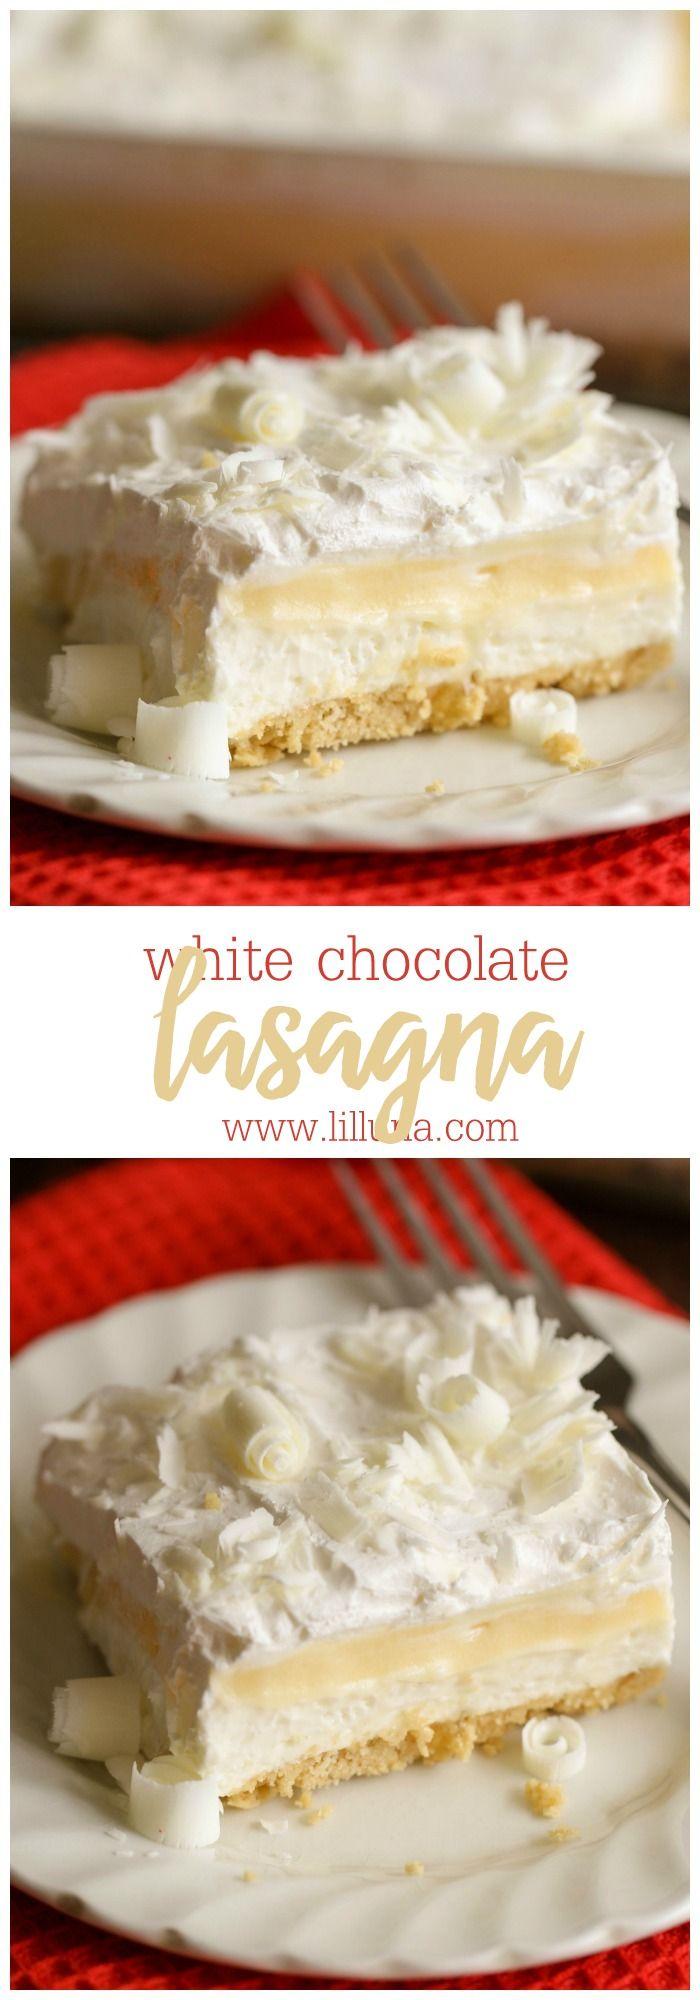 White Chocolate Lasagna | Recipe | Chocolate lasagna, Chocolate ...